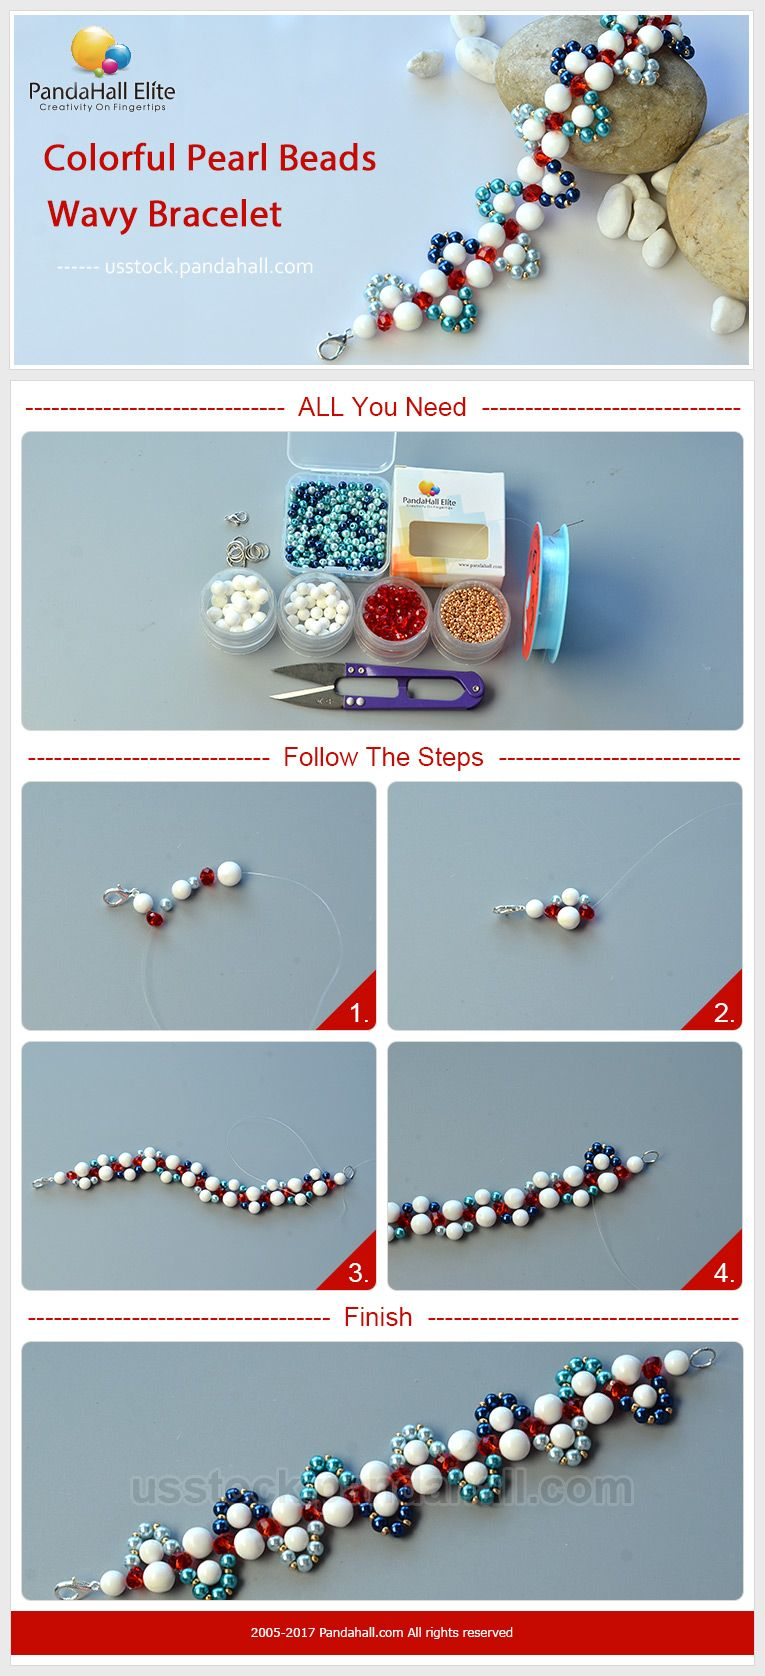 pandahall elite diy colorful pearl beads wavy bracelet   gratis